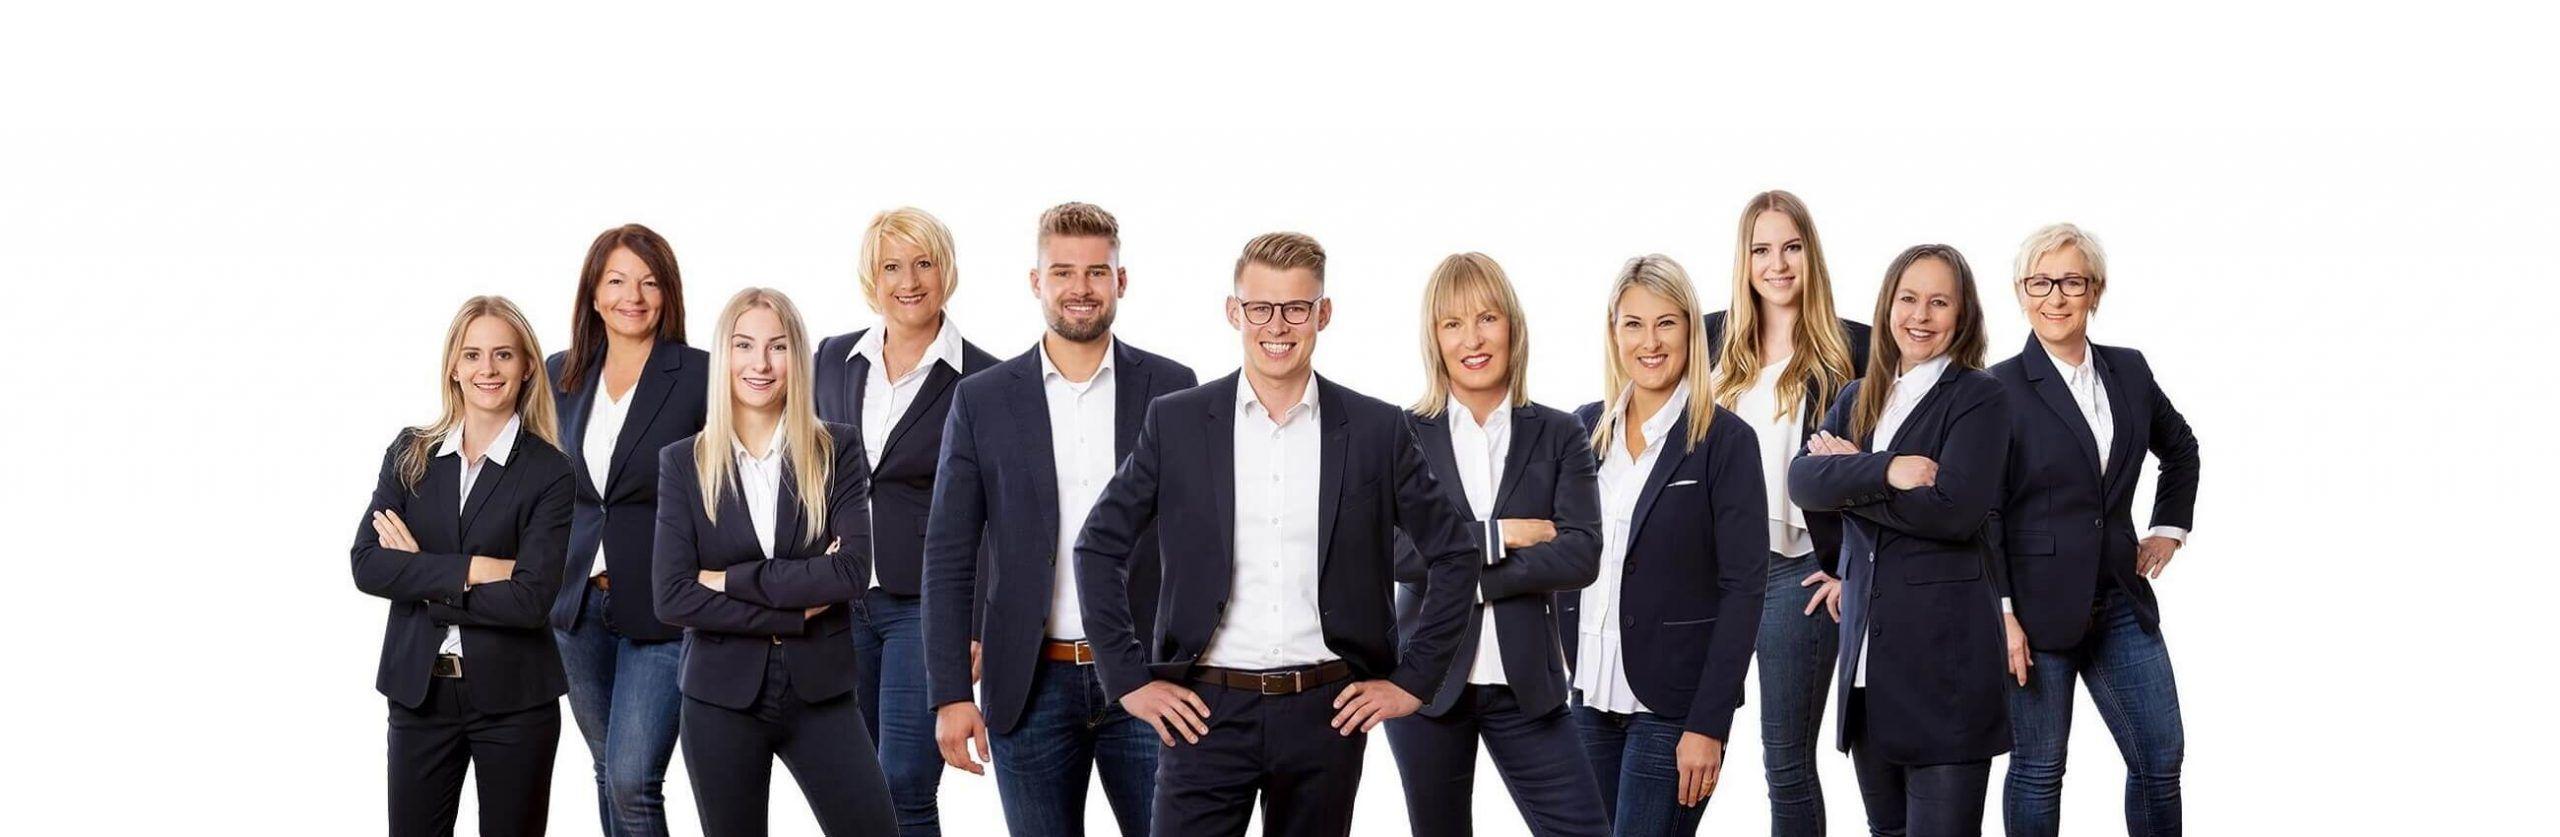 Team Köhl-Jetter Immobilien GmbH & Köhl Hausverwaltungen GmbH & Co. KG